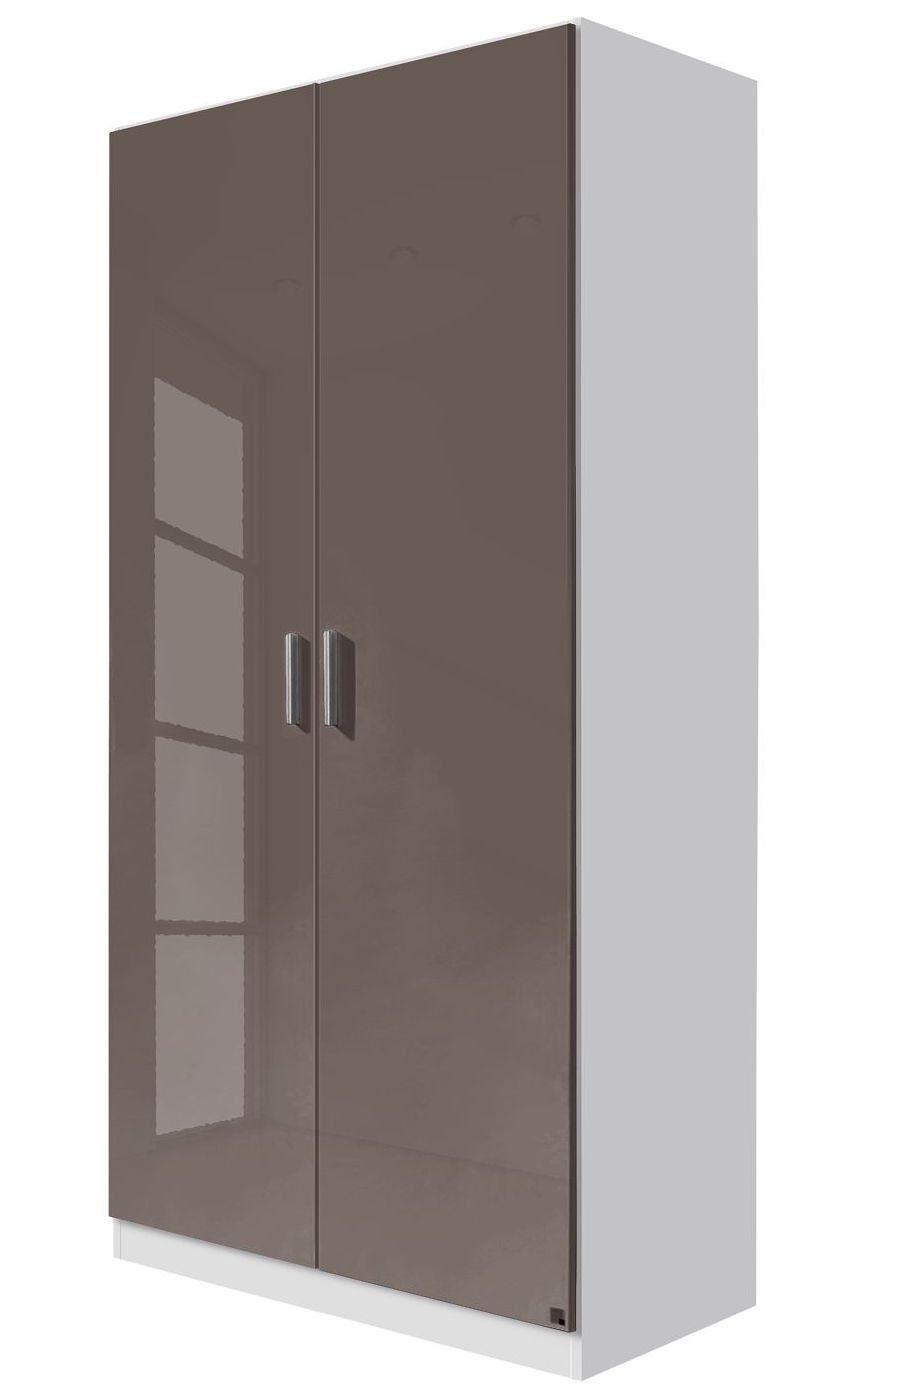 Armoire 2 Portes Battantes Taupe Brillant Et Blanc Mat Bello 90 Armoire 2 Portes Armoire Porte Battante